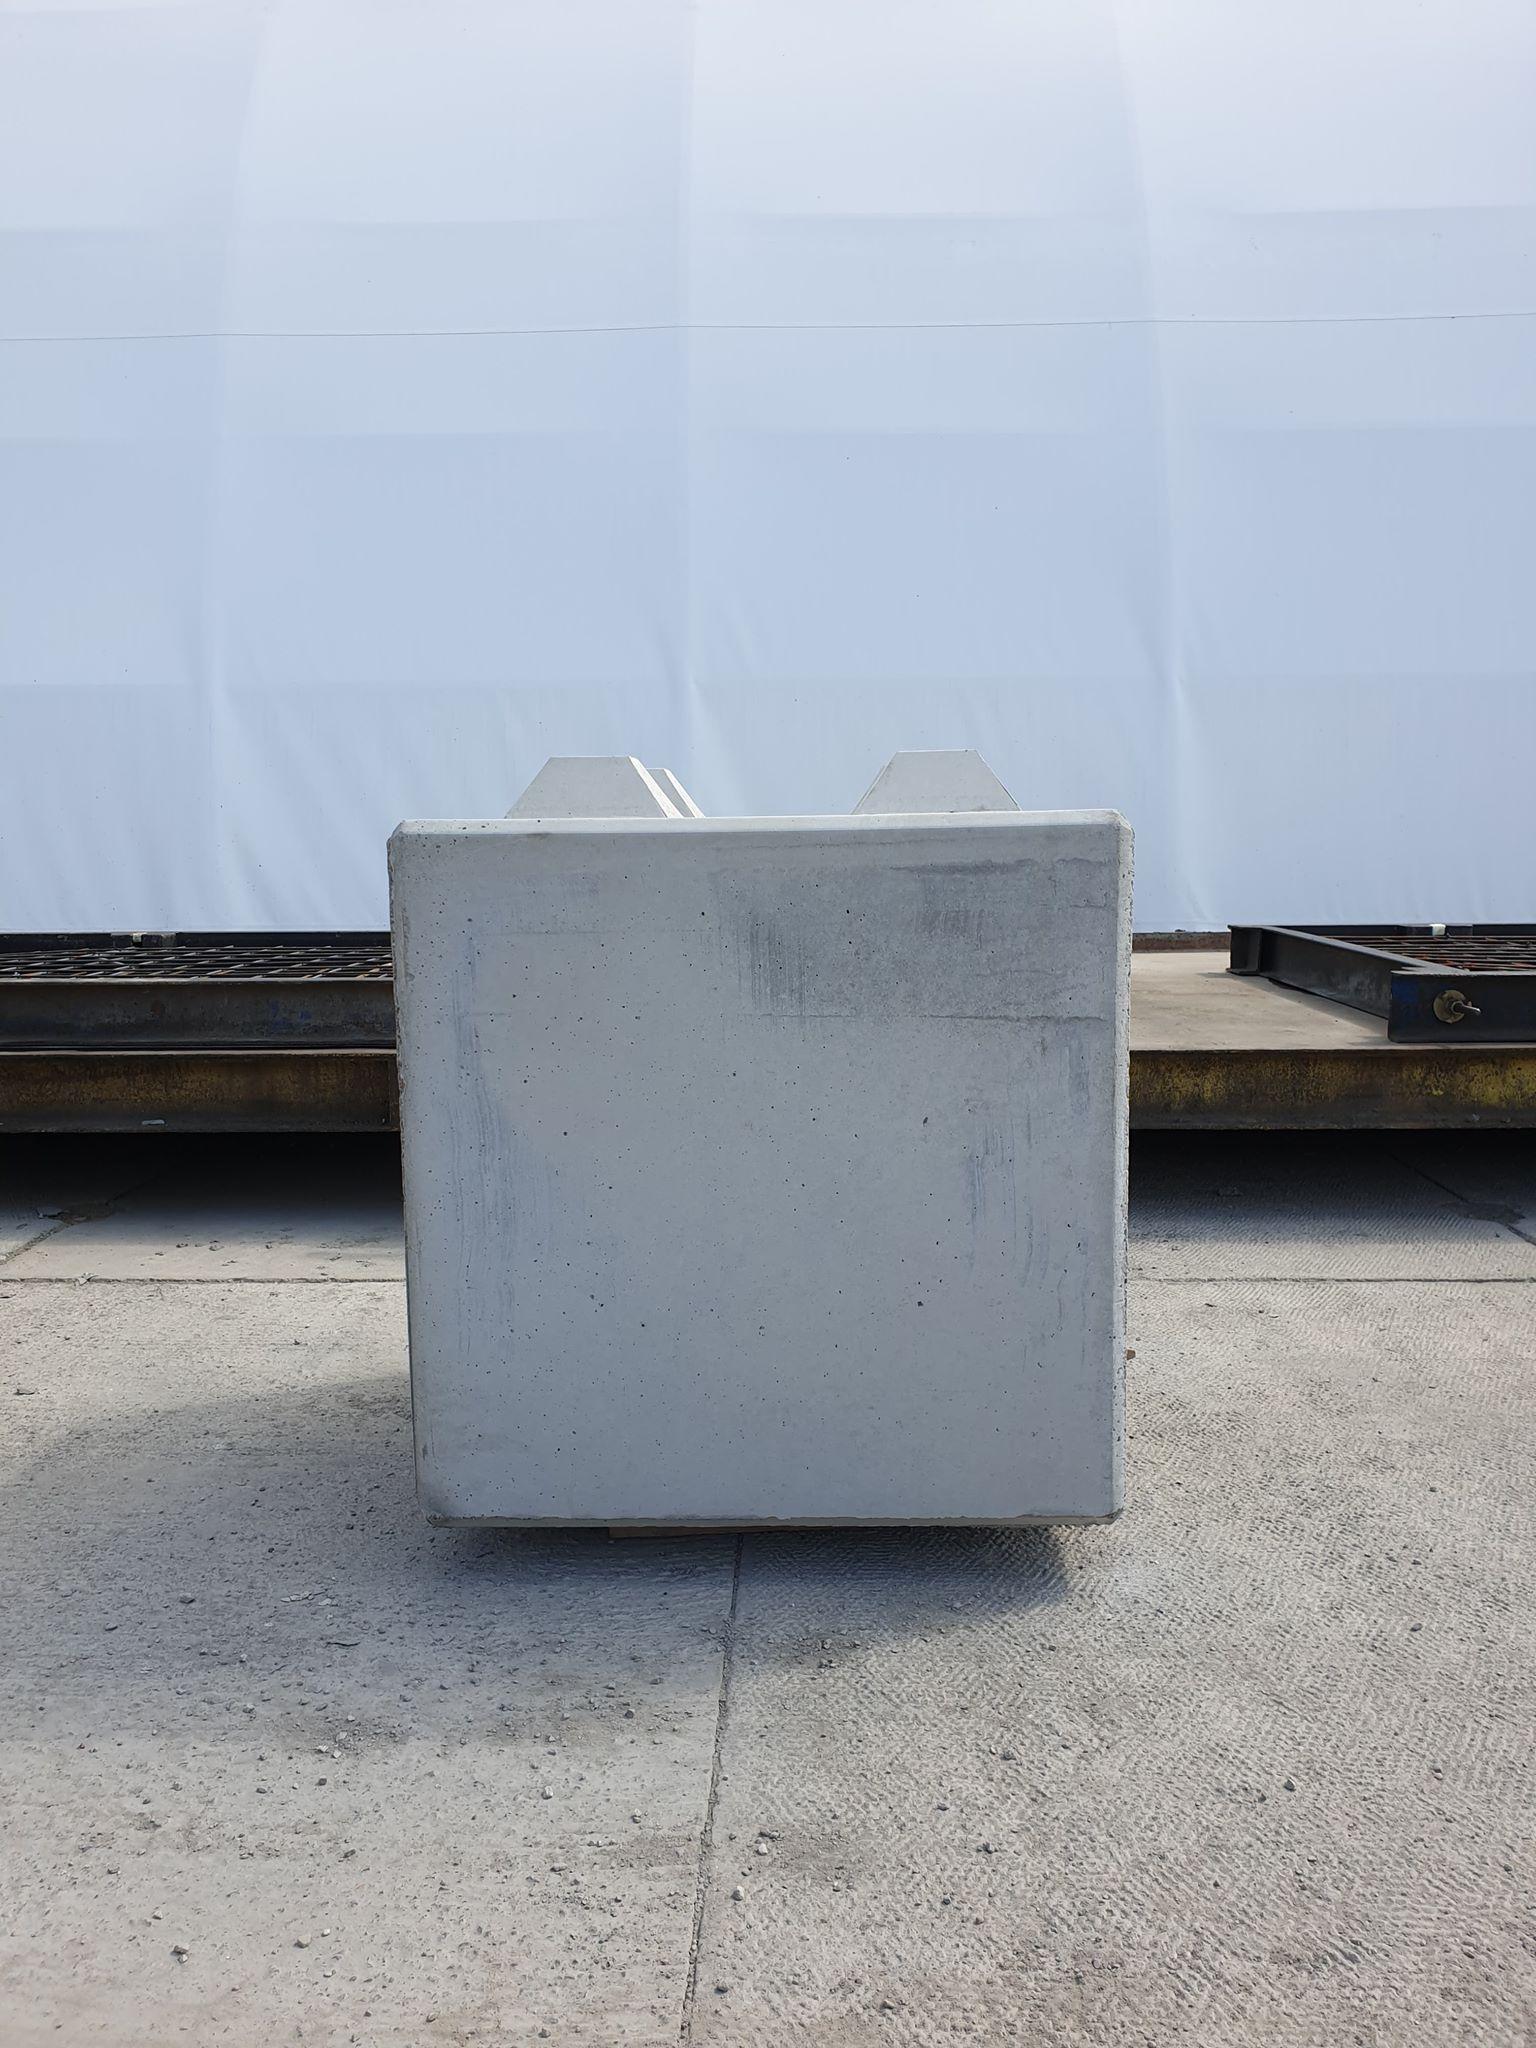 Betonblok o wymiarach 80x80x80